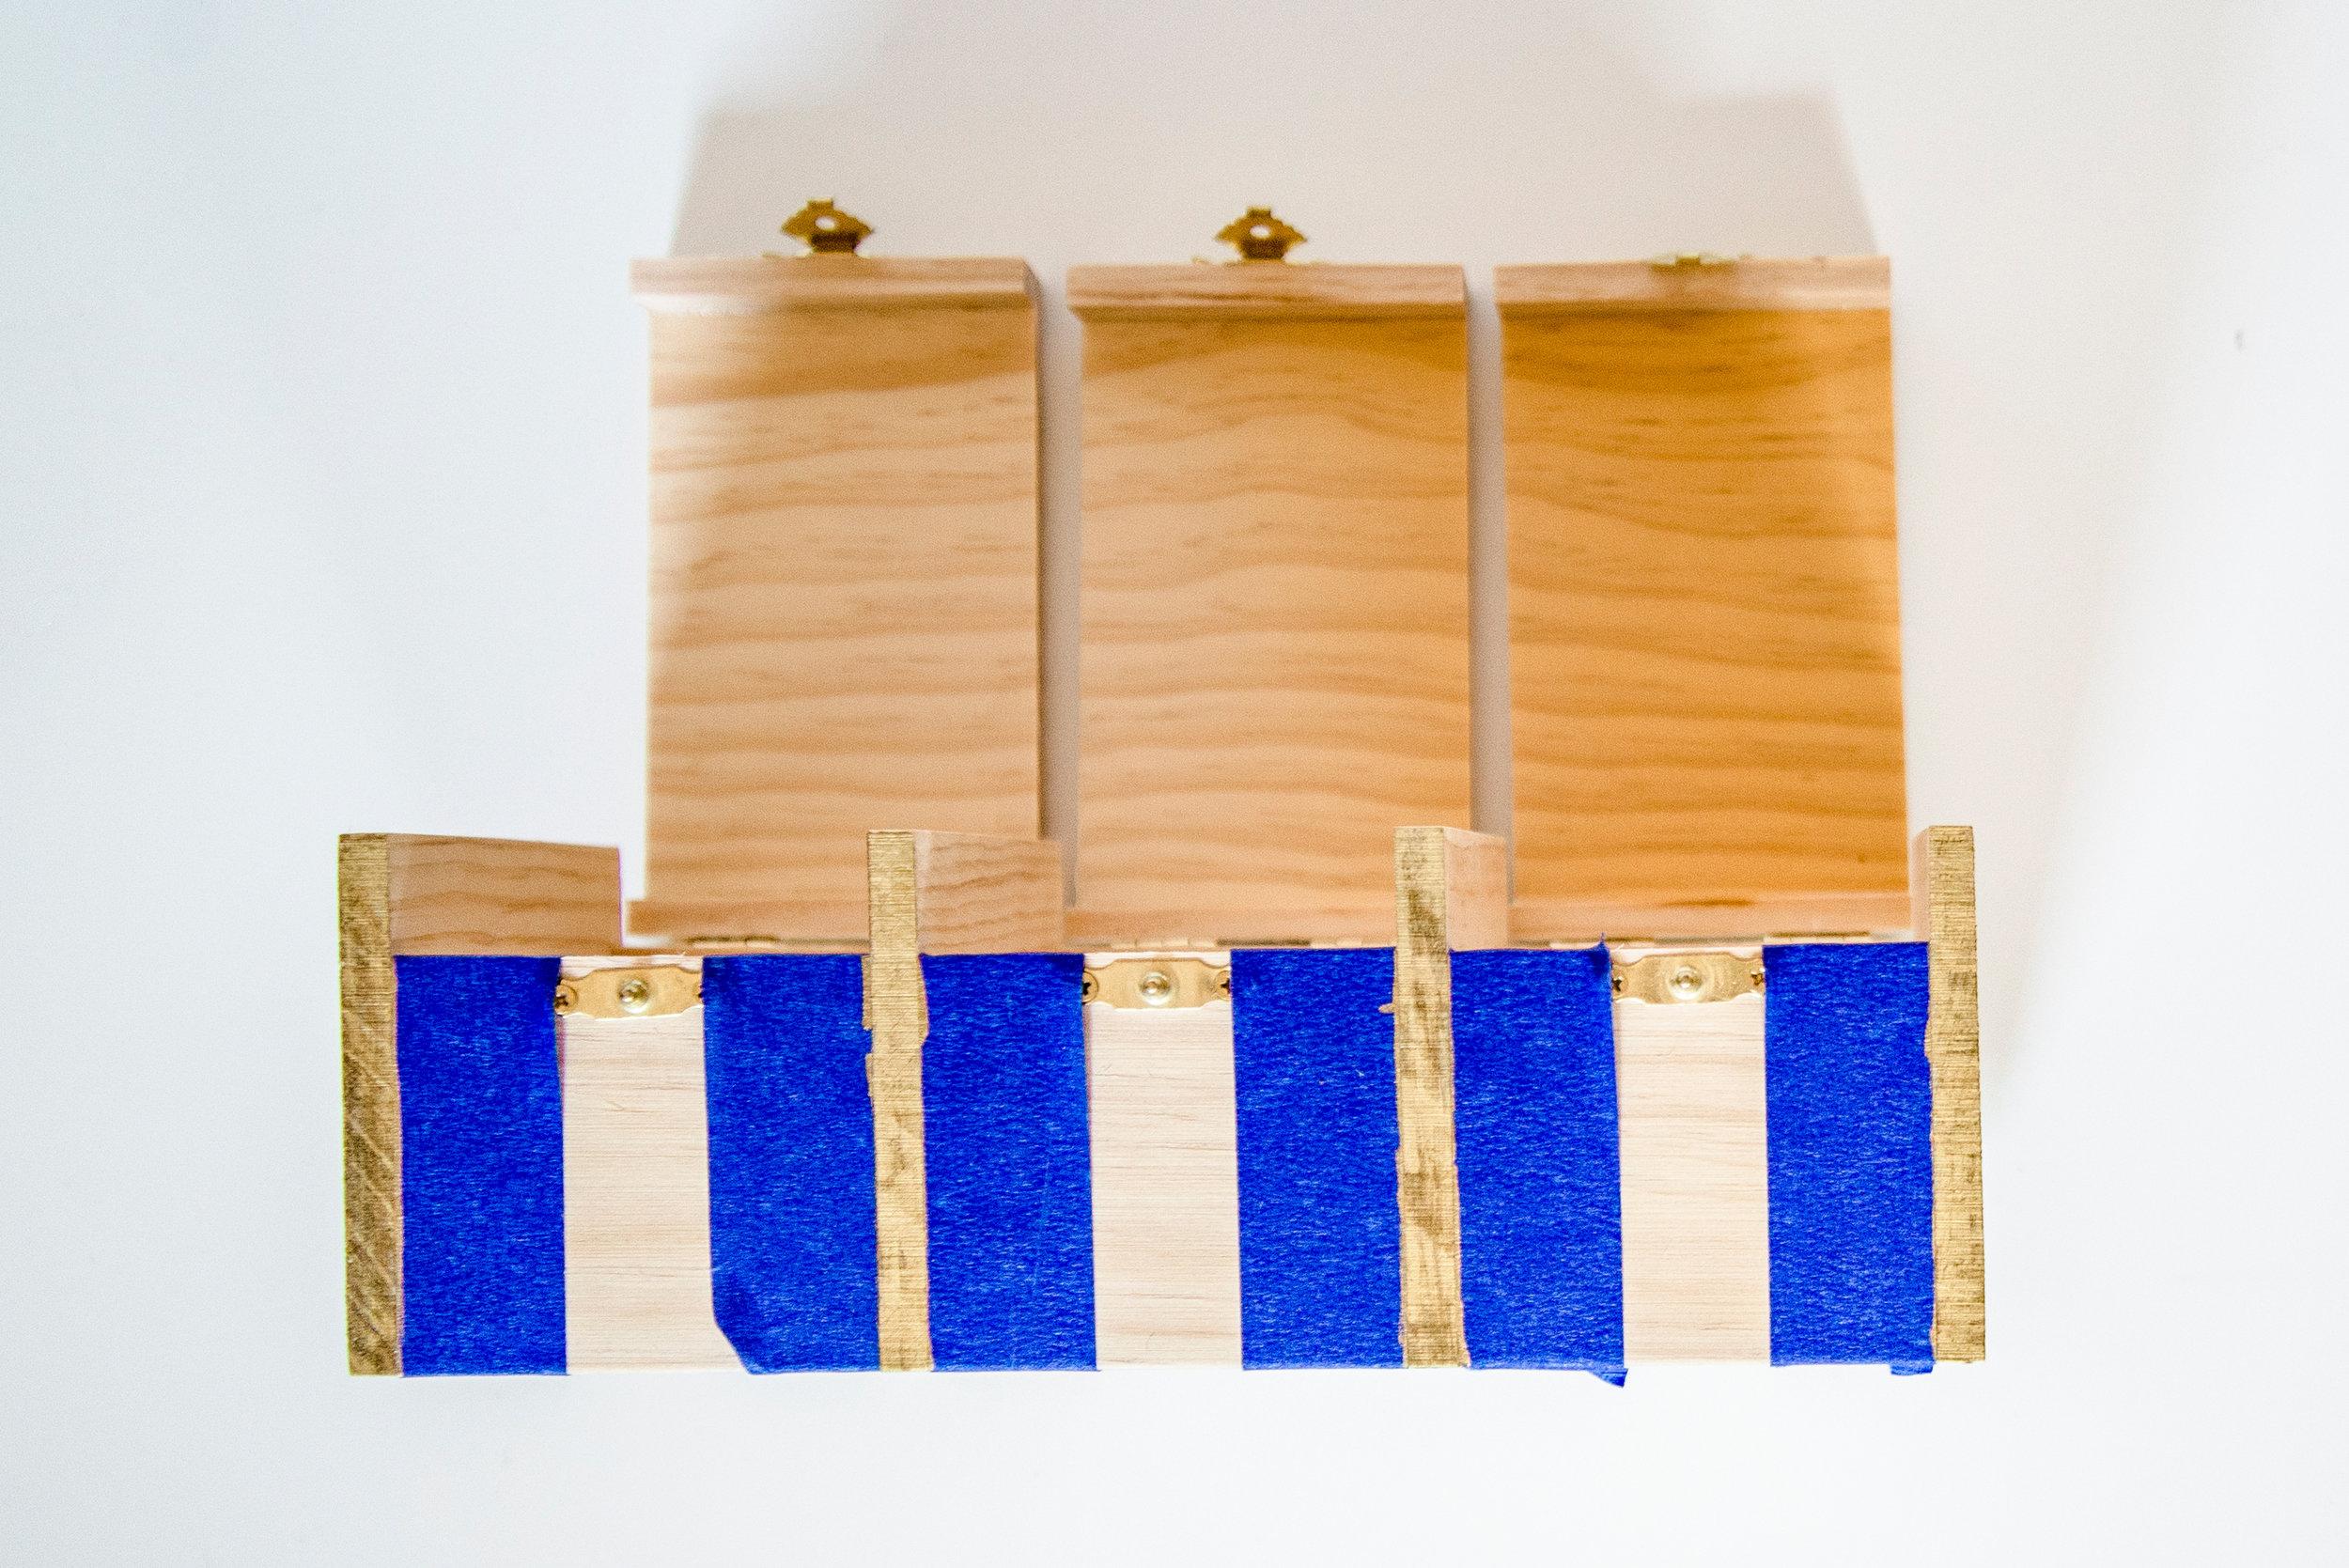 DIY Tea Box Sides Taped